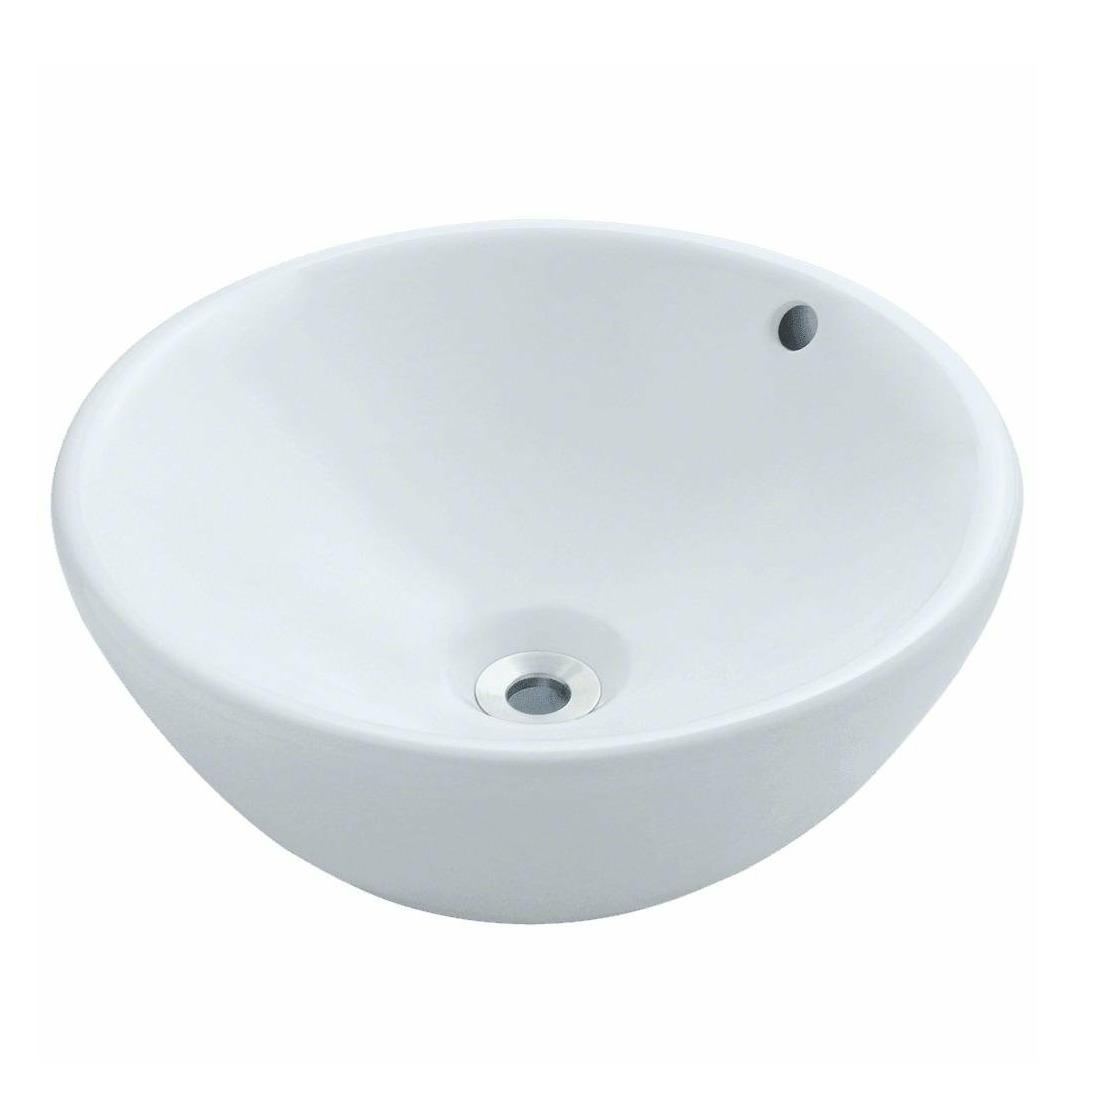 Ovalin lavabo lavamanos porcelana china aut ntica 41cm for Lavabo de manos